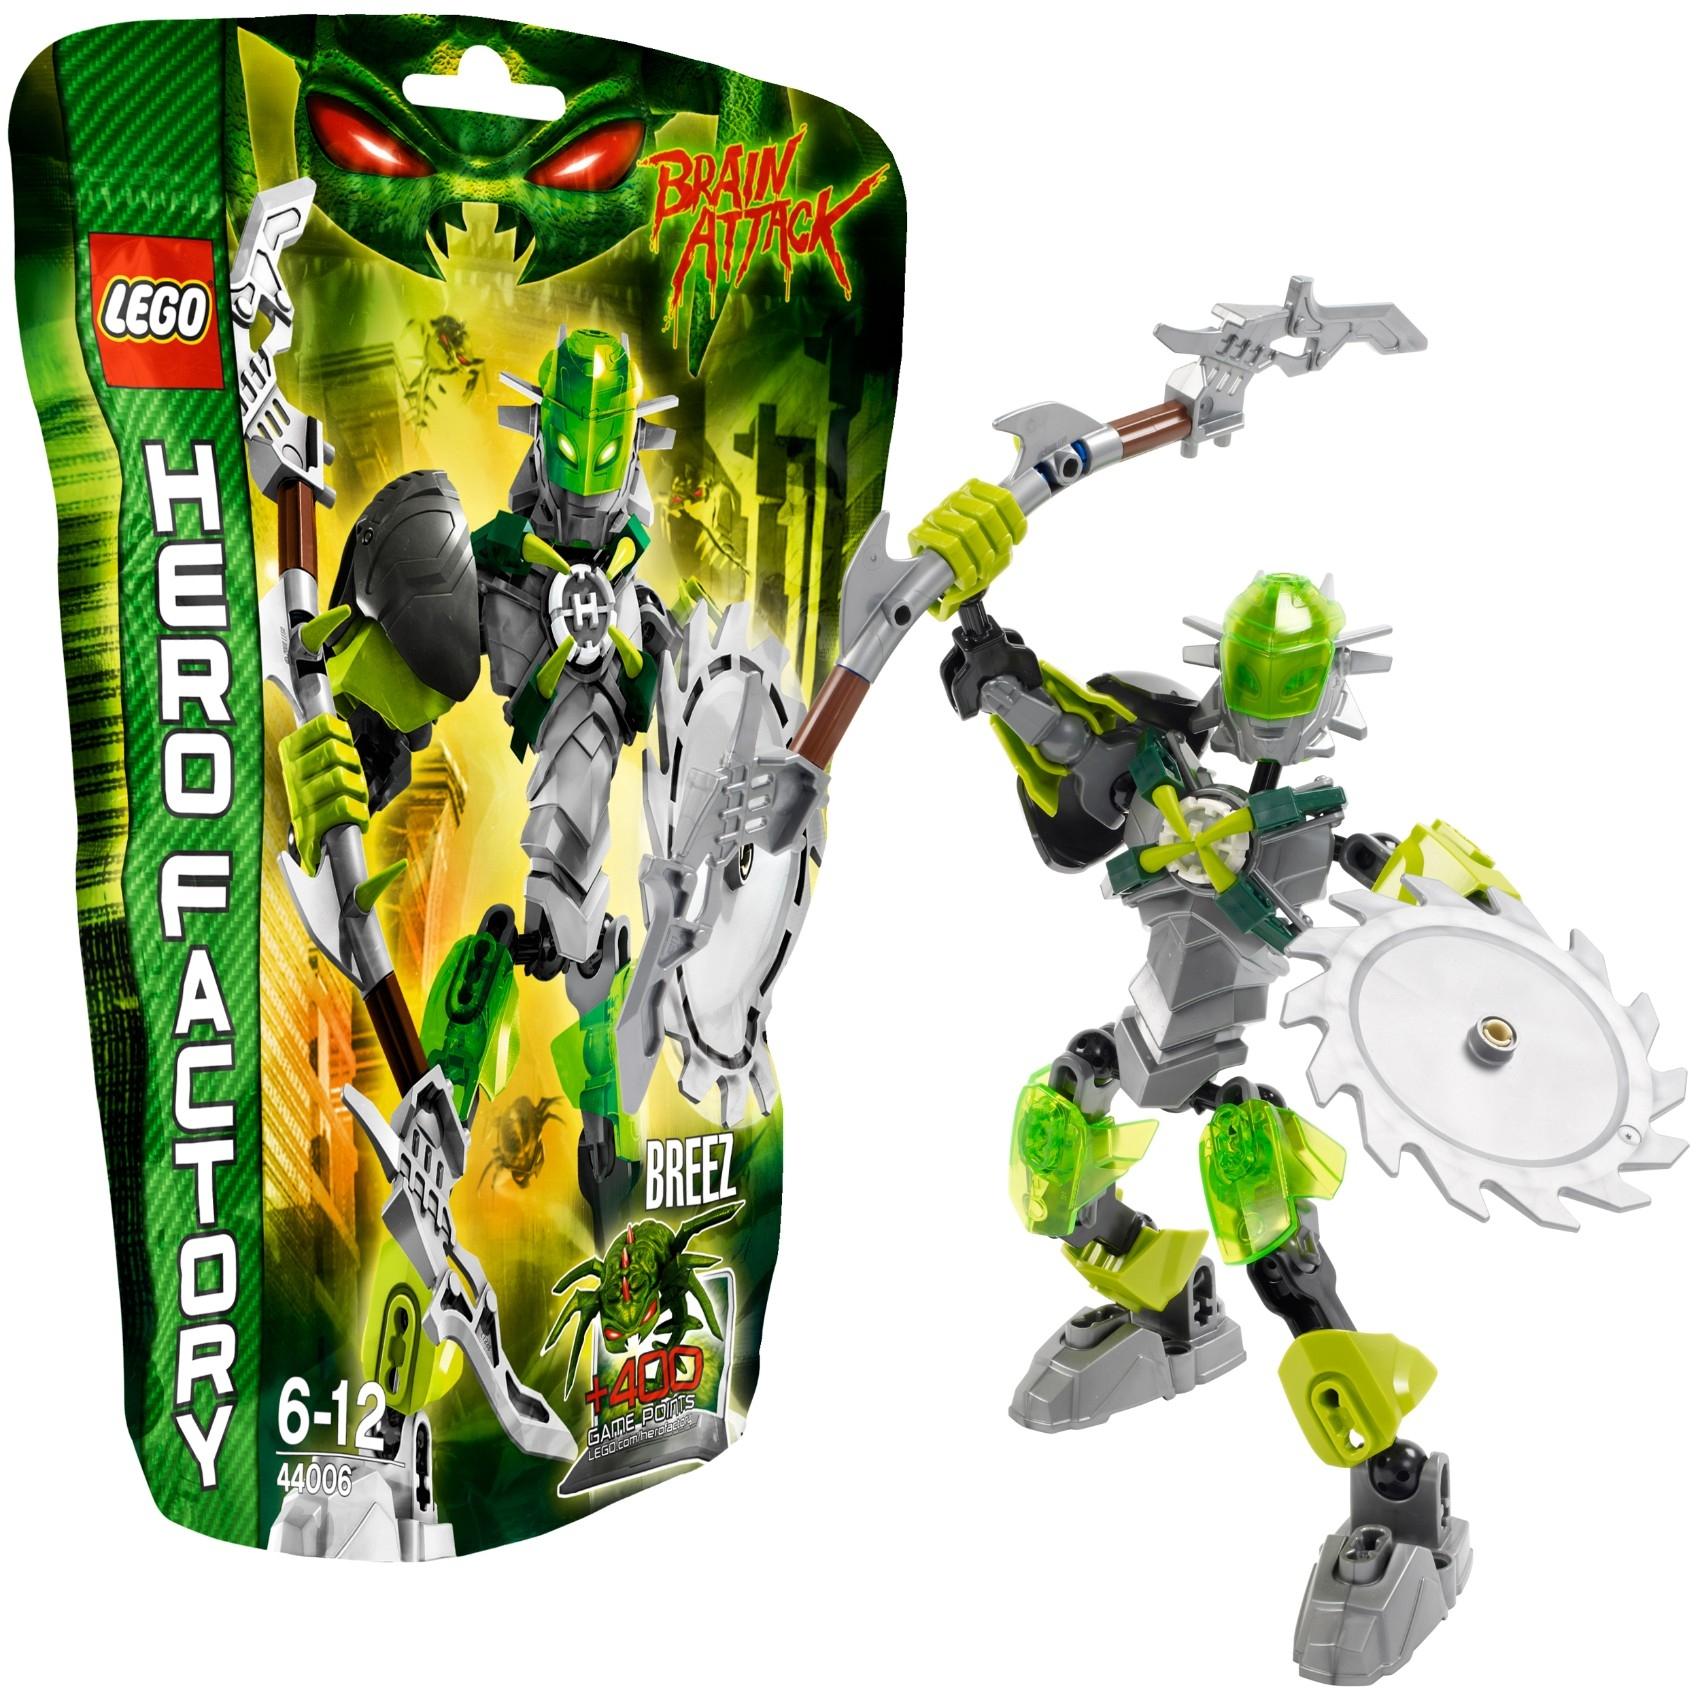 Lego factory 44006